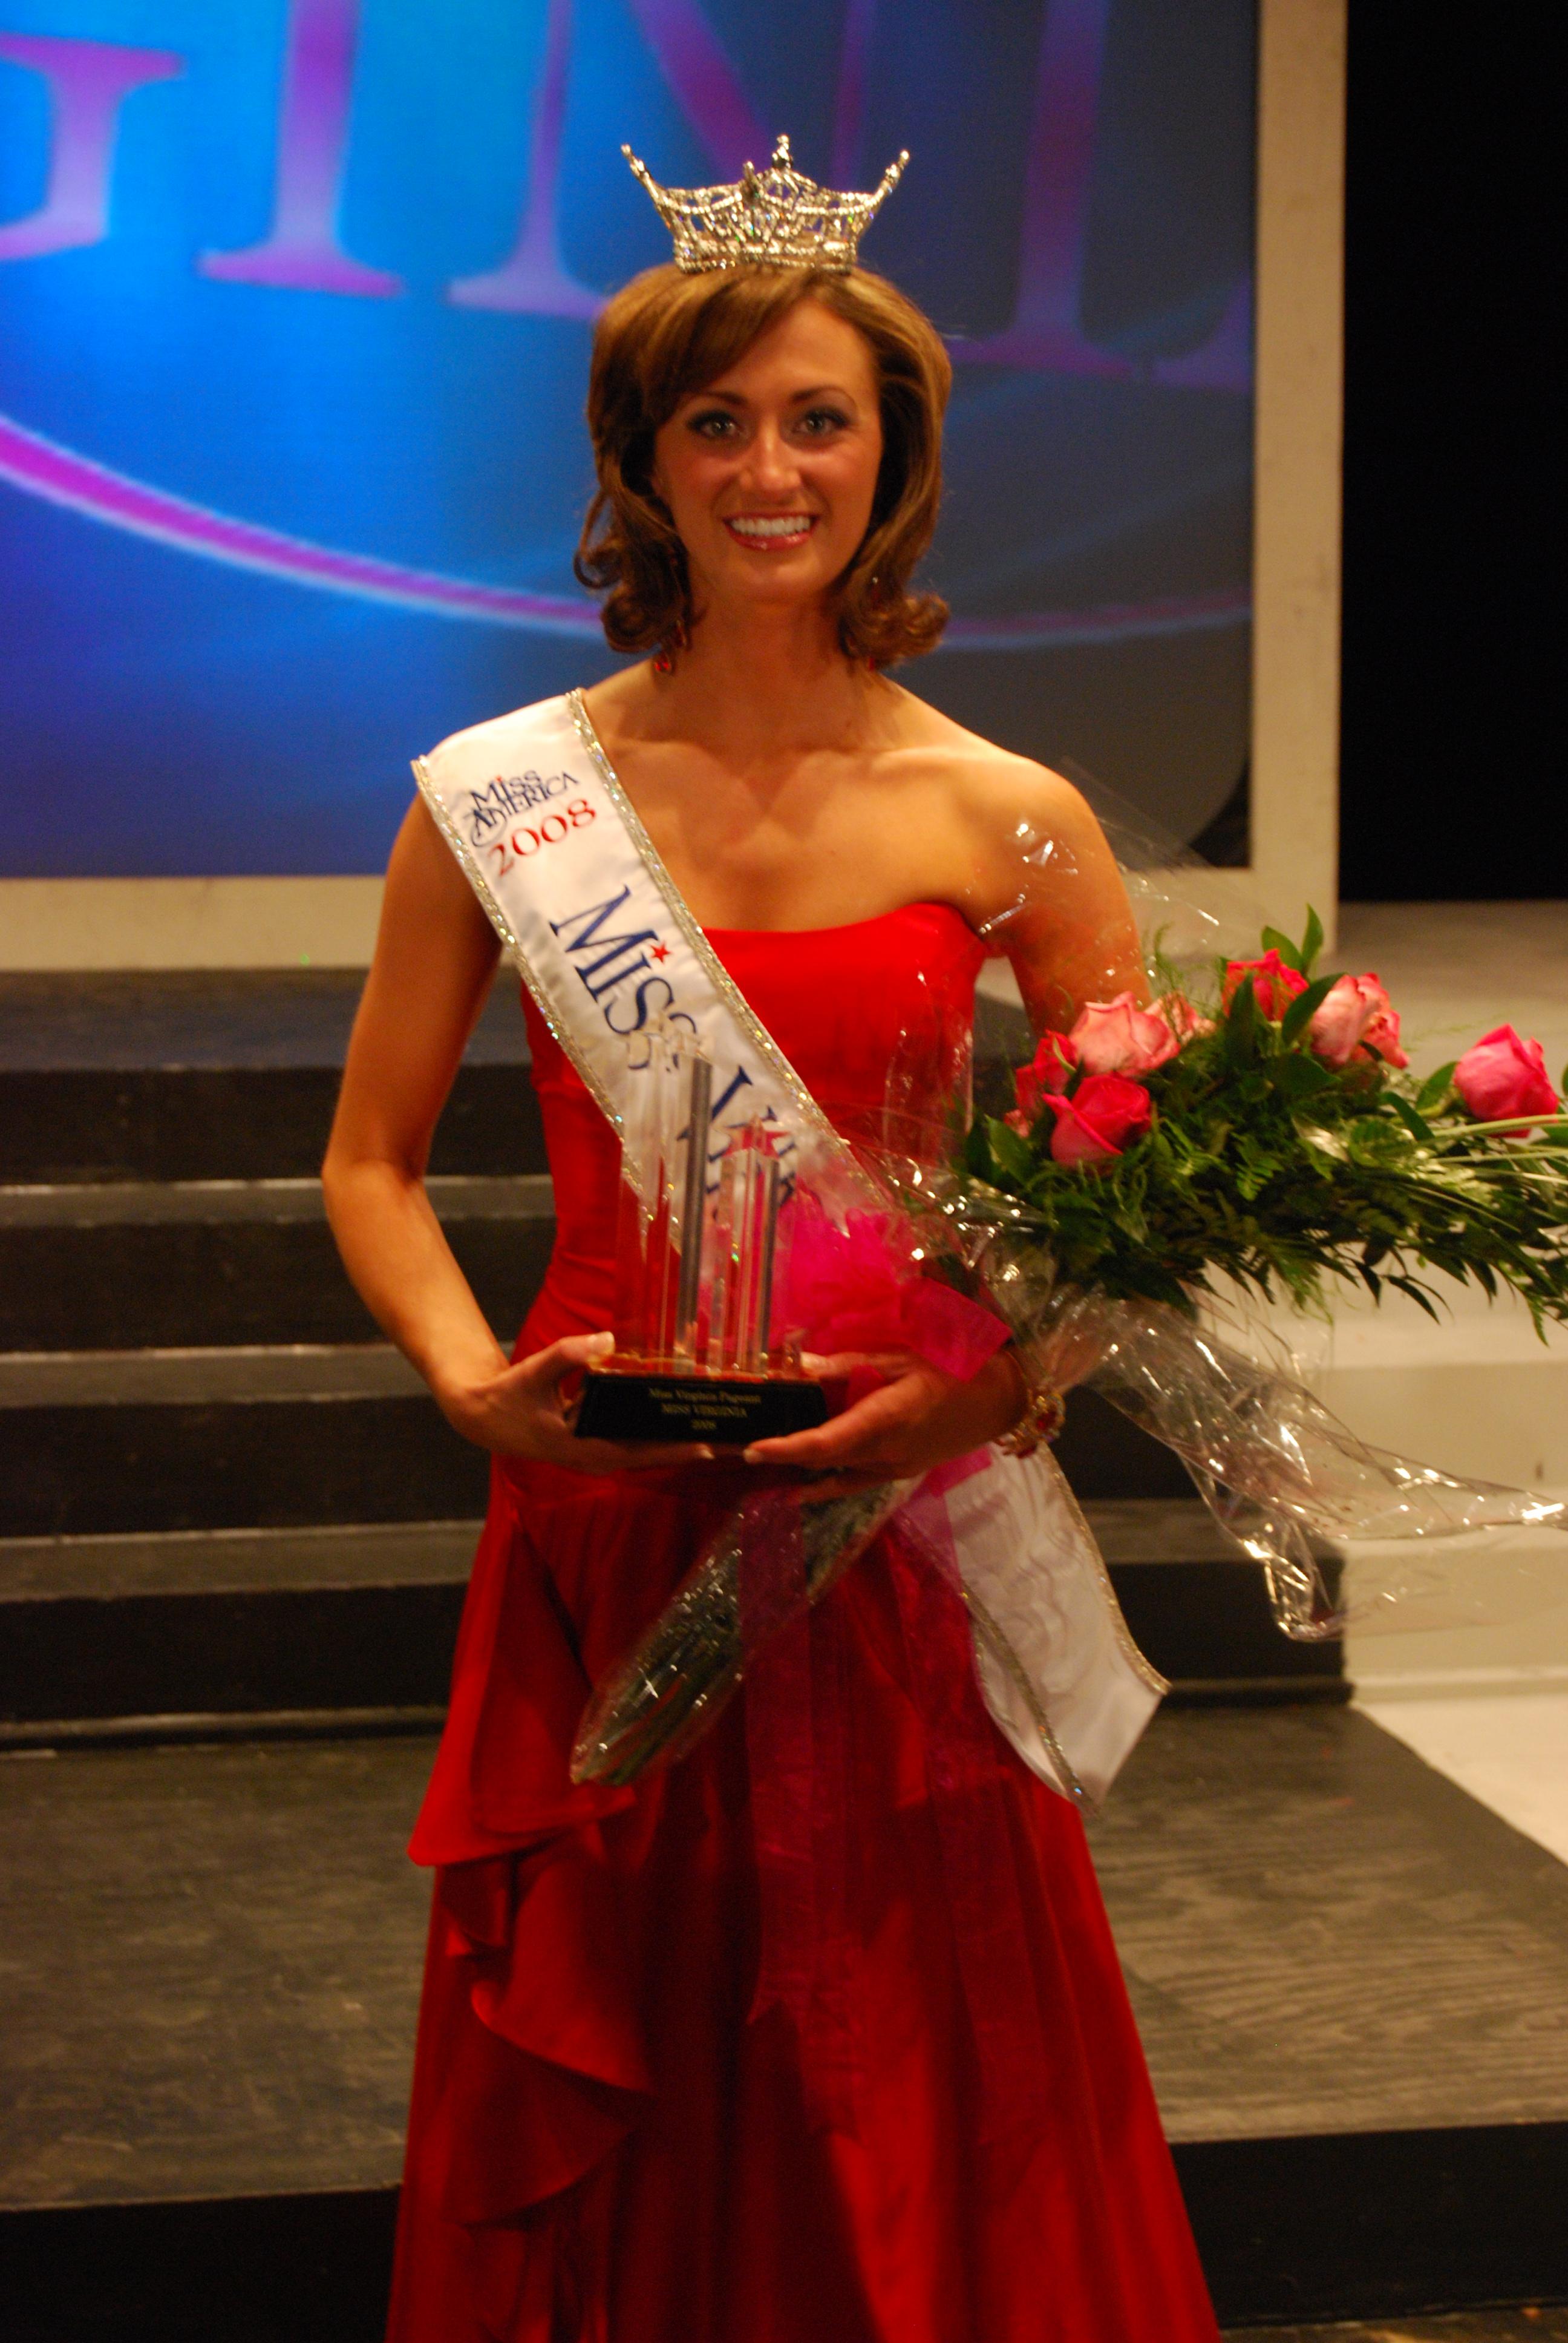 Photo taken shortly after Tara Wheeler was crowned Miss Virginia 2008